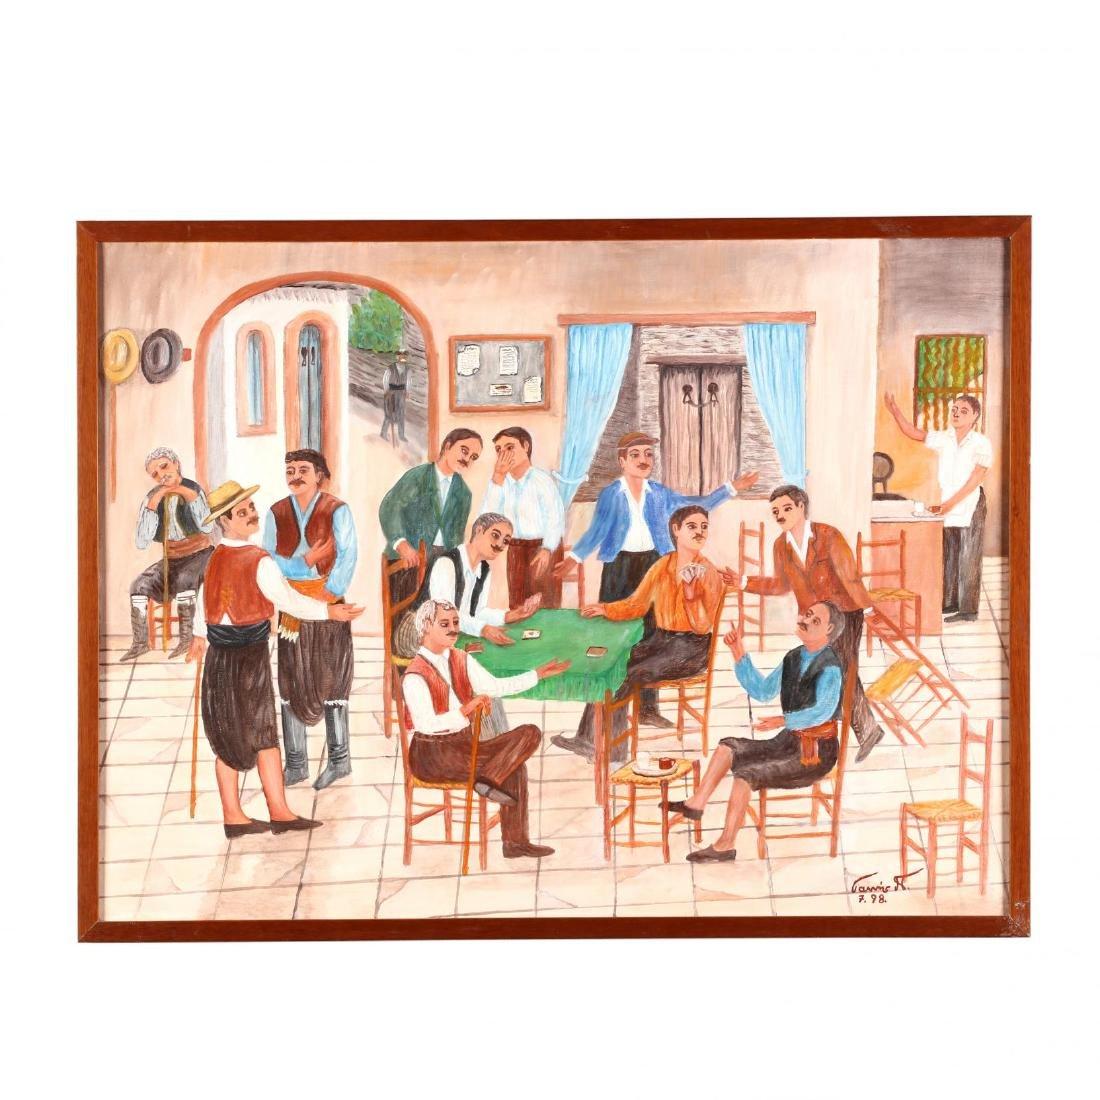 Yiannis Pelekanos (Cypriot, b. 1937), Tavern Card Game